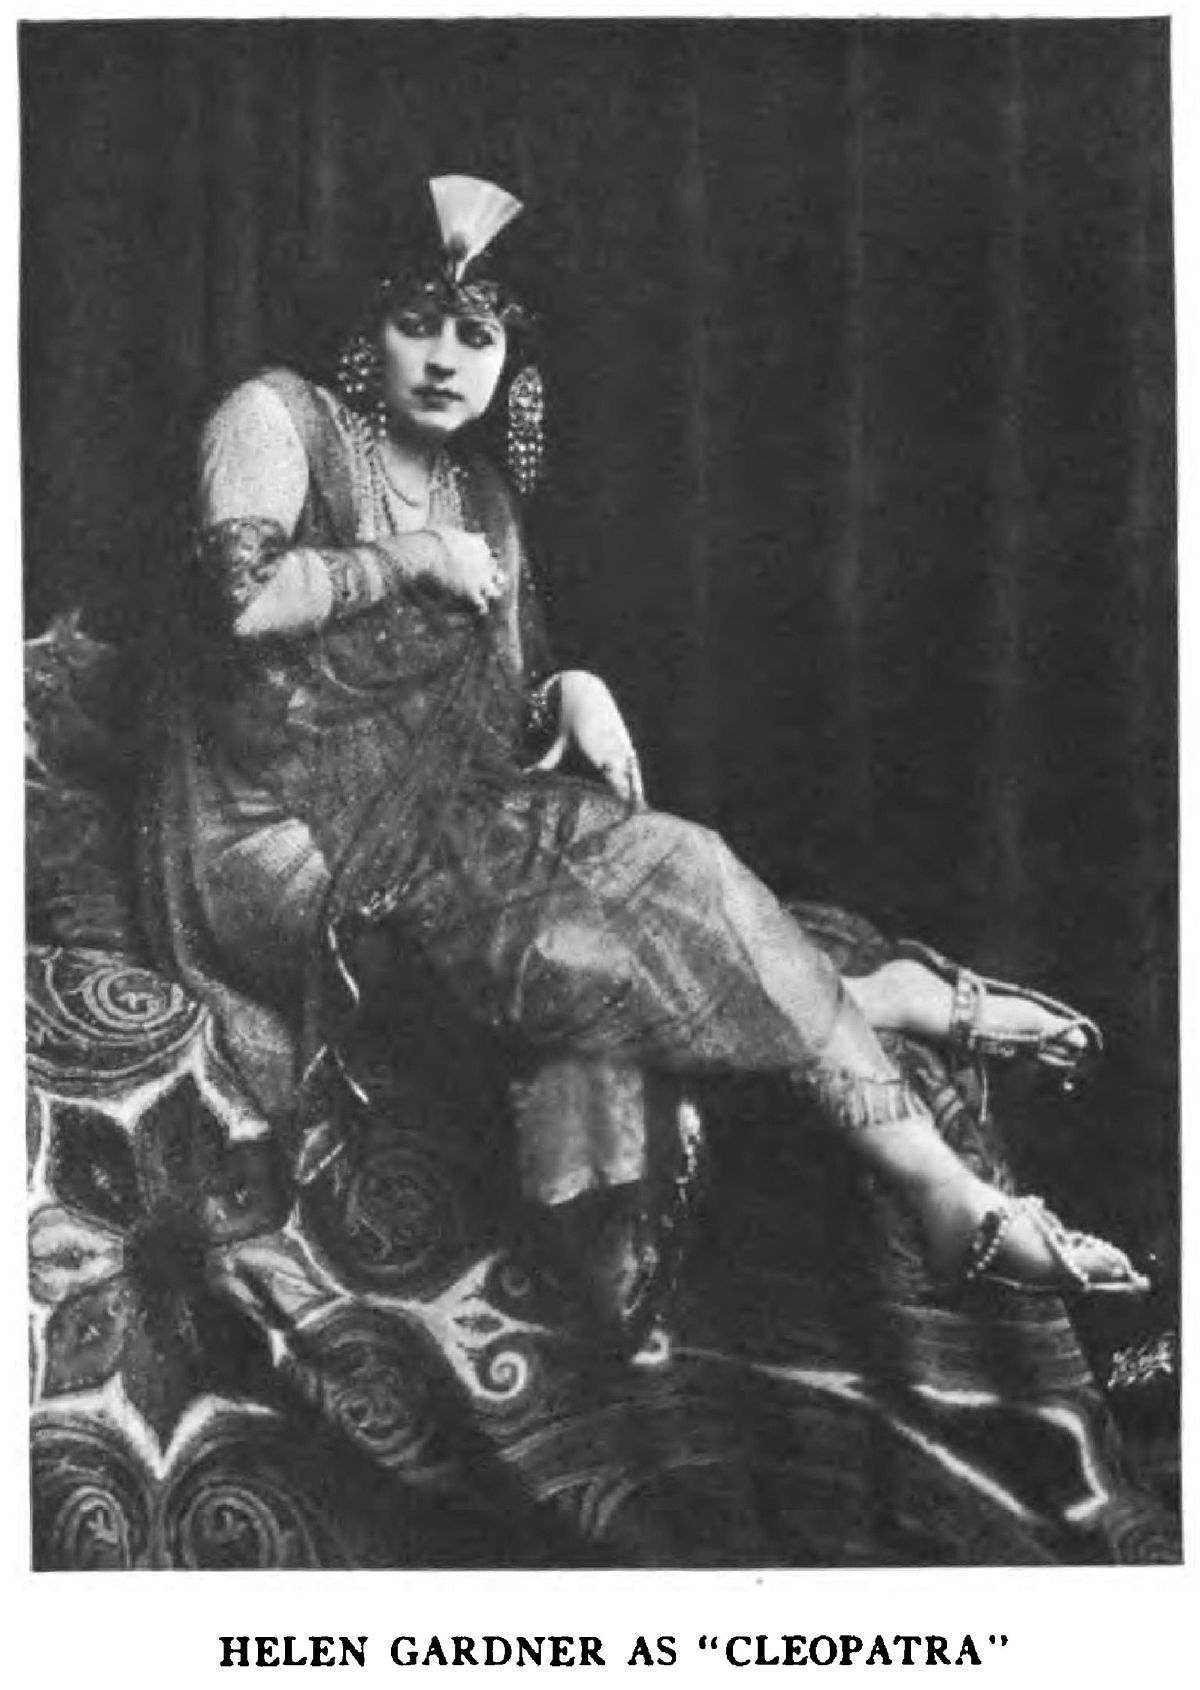 Cleopatra (1912 film) - Wikipedia